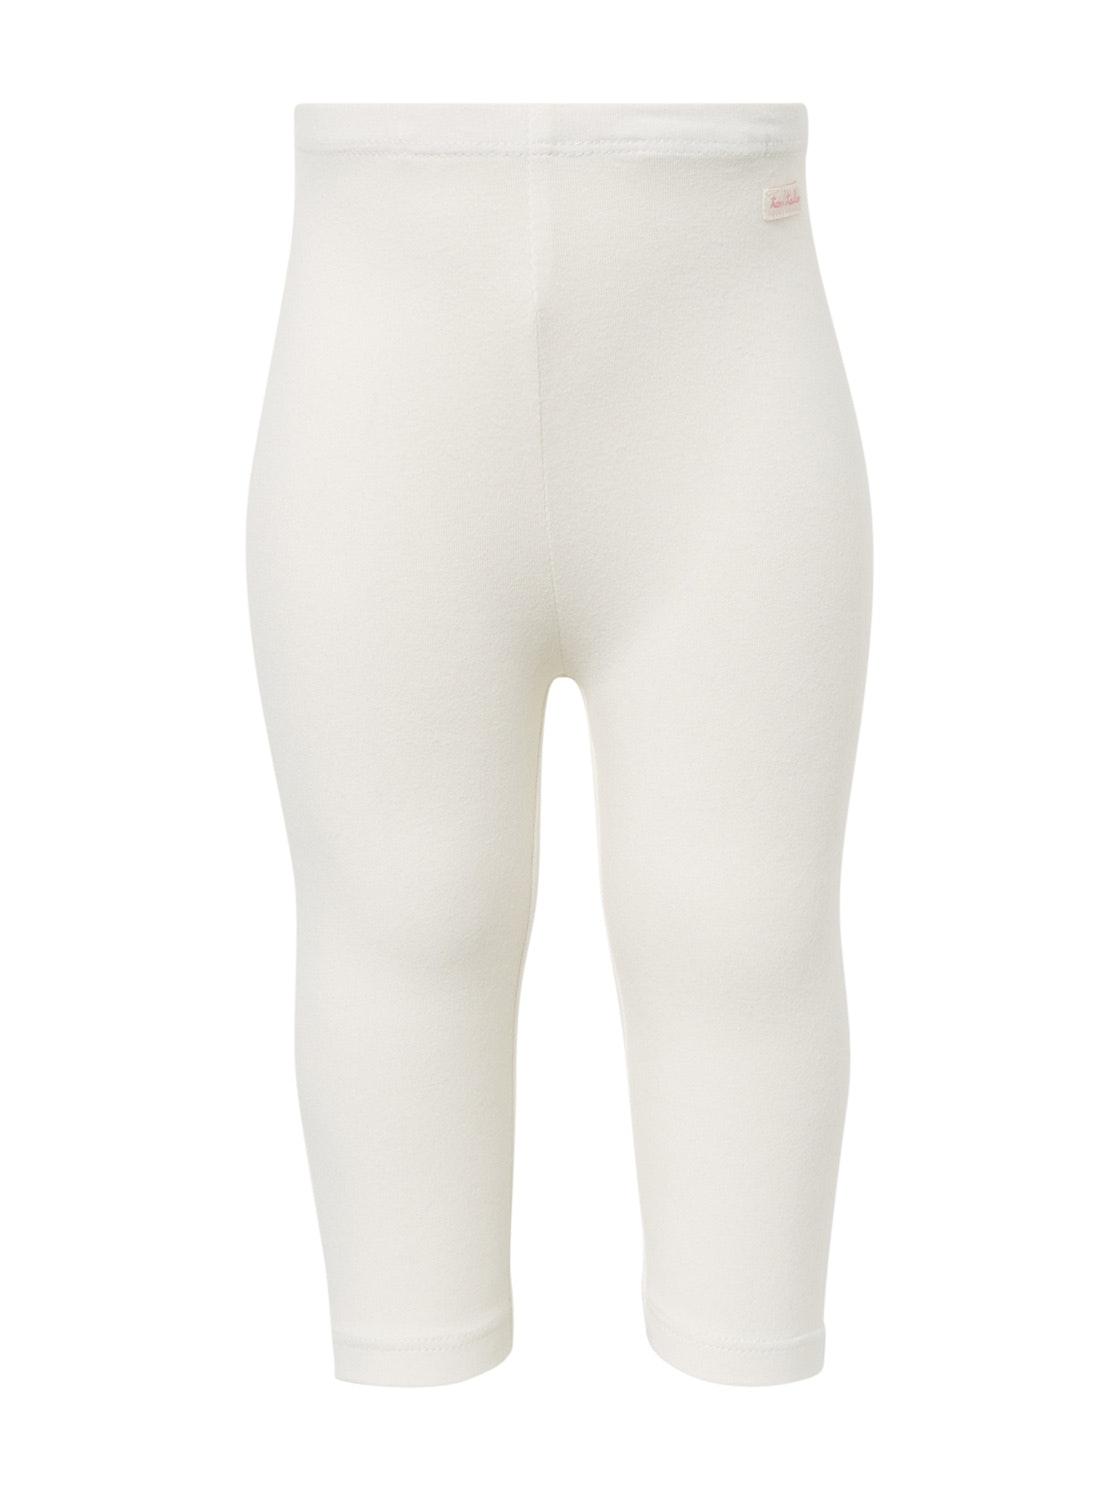 leggings solid, cloud dancer-white